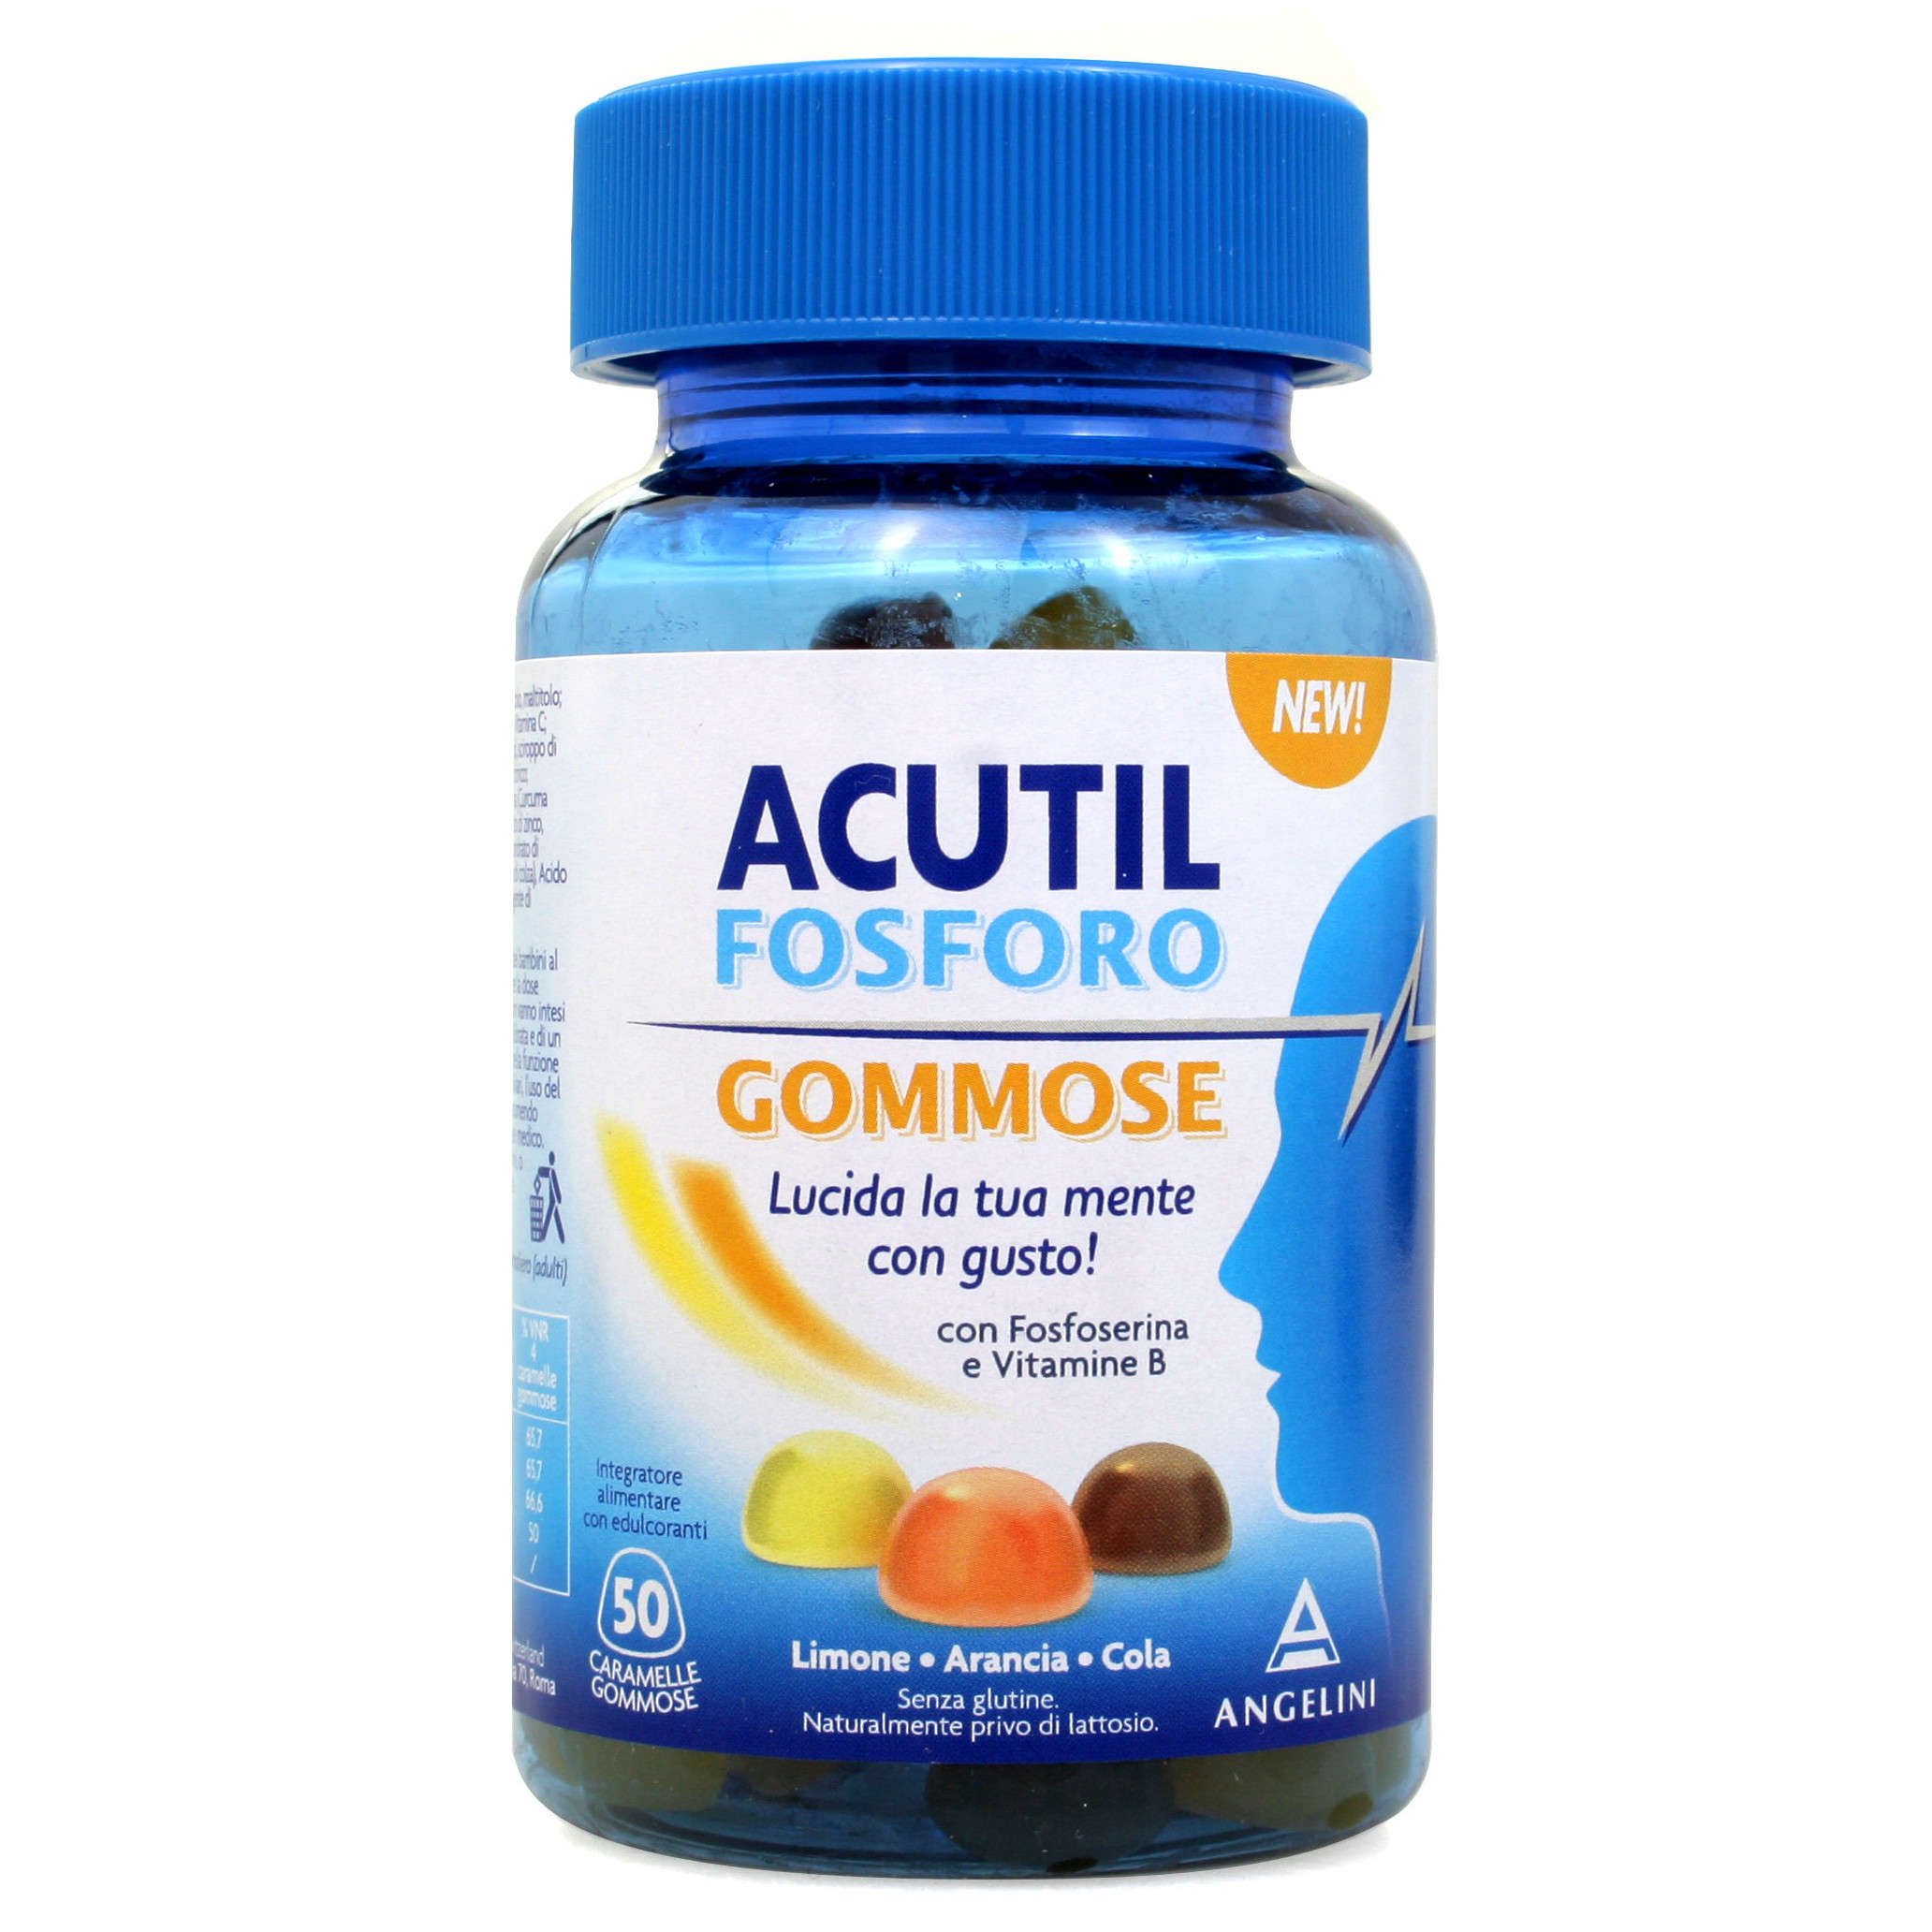 Acutil - Fosforo - Gommose